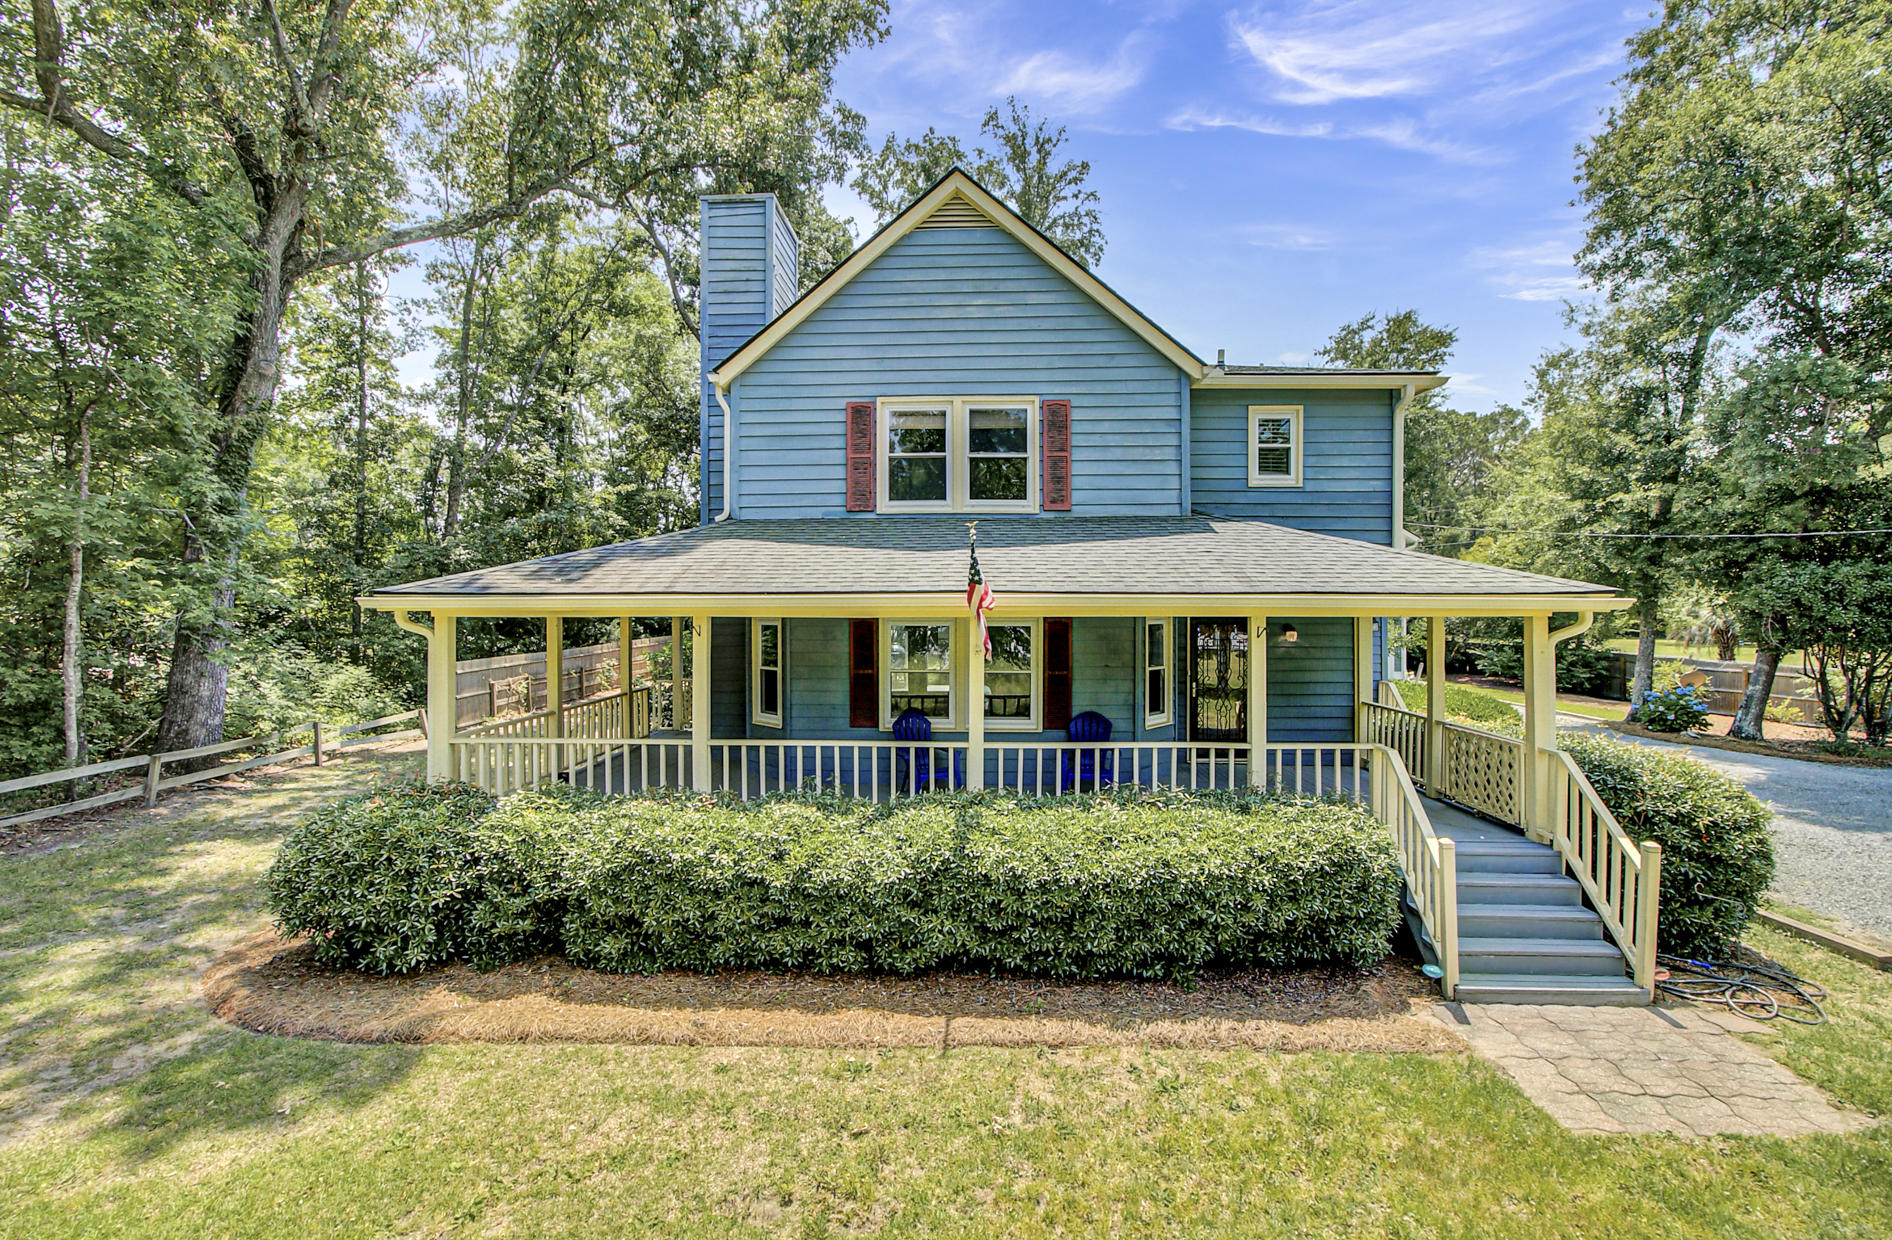 Yaugh Hall Homes For Sale - 1229 Porchers Bluff, Mount Pleasant, SC - 26